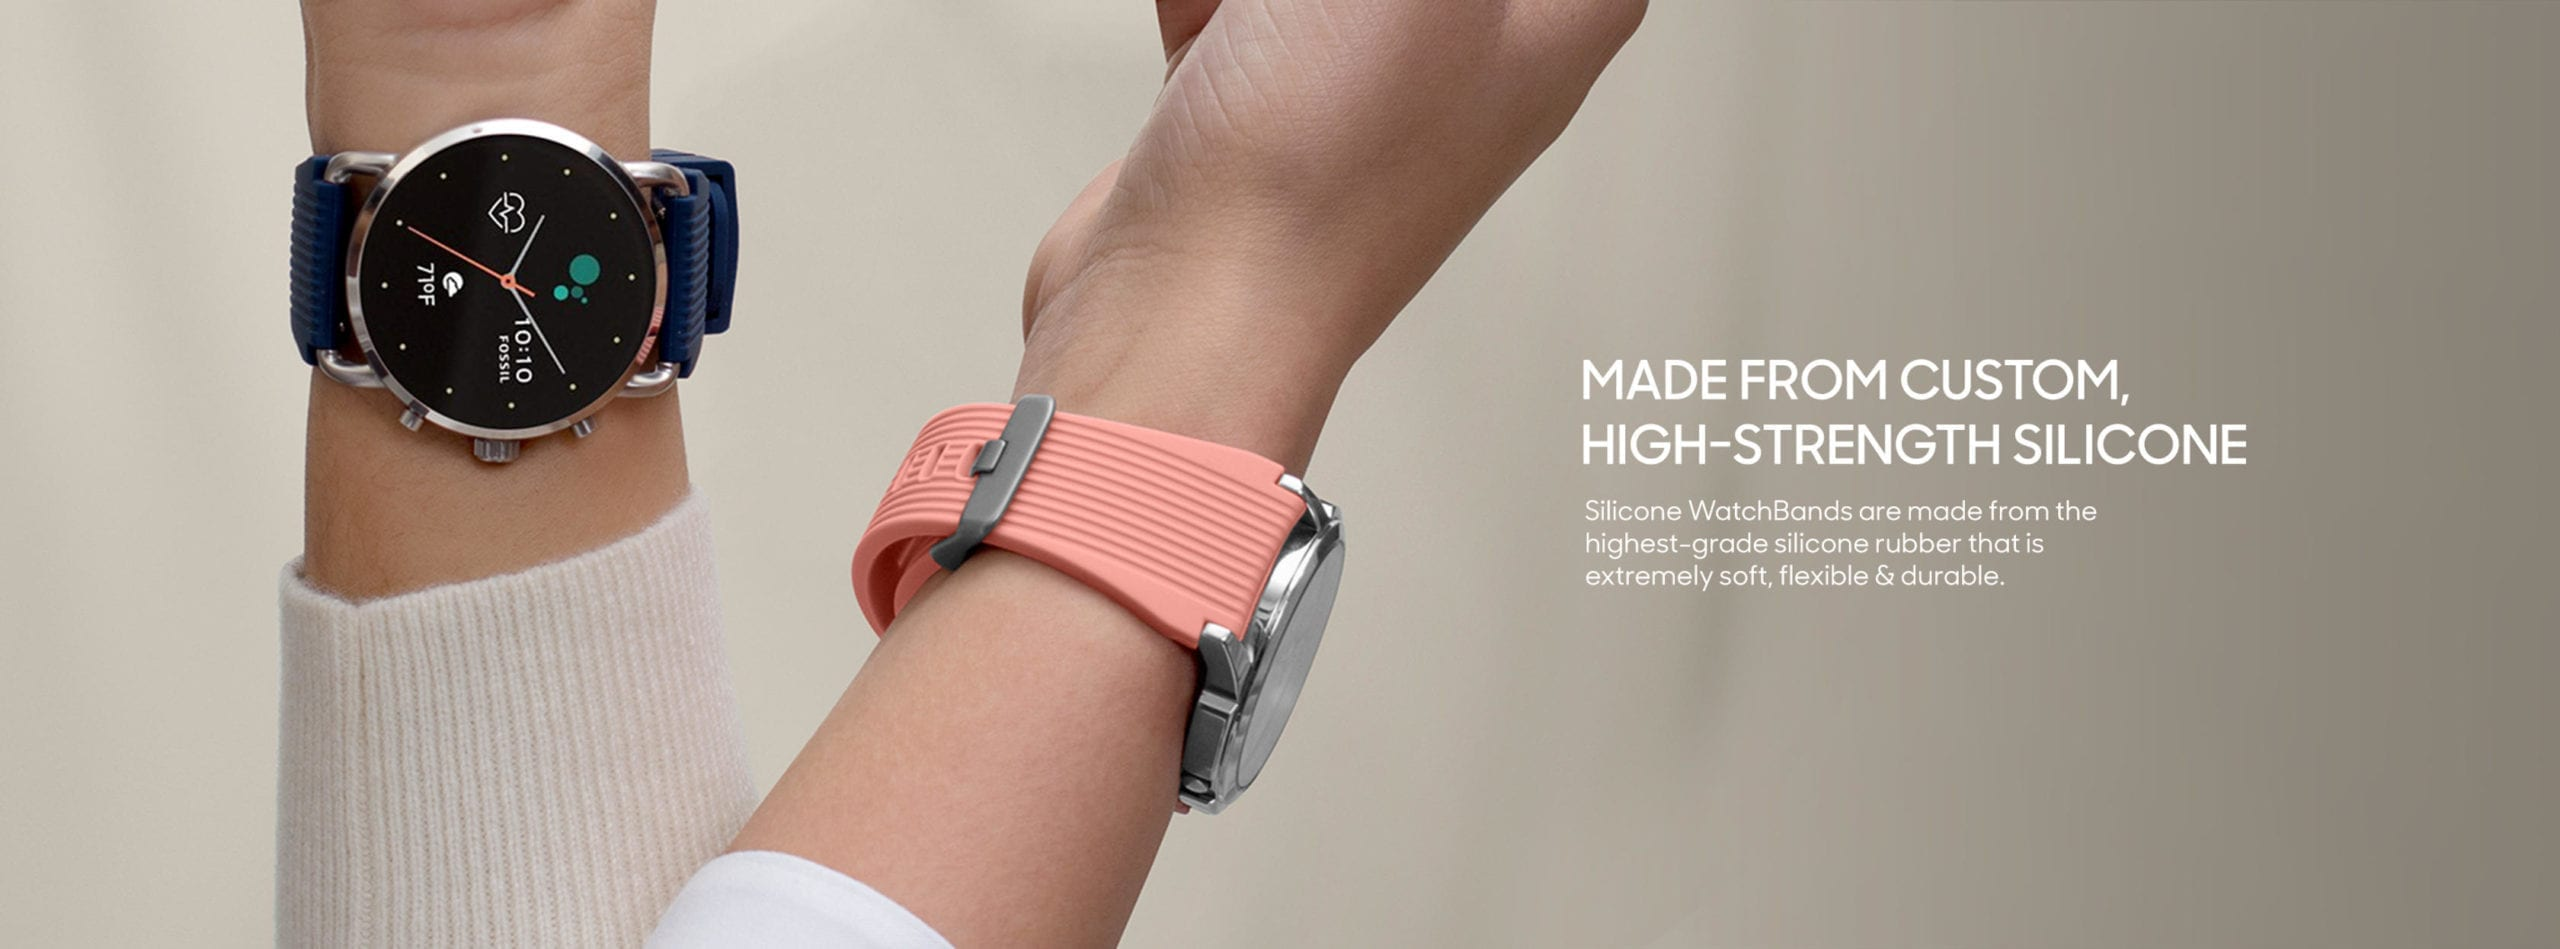 Black Silicone Universal WatchBand for Samsung, Huawei Smart Watches | Klippik | Online SHopping